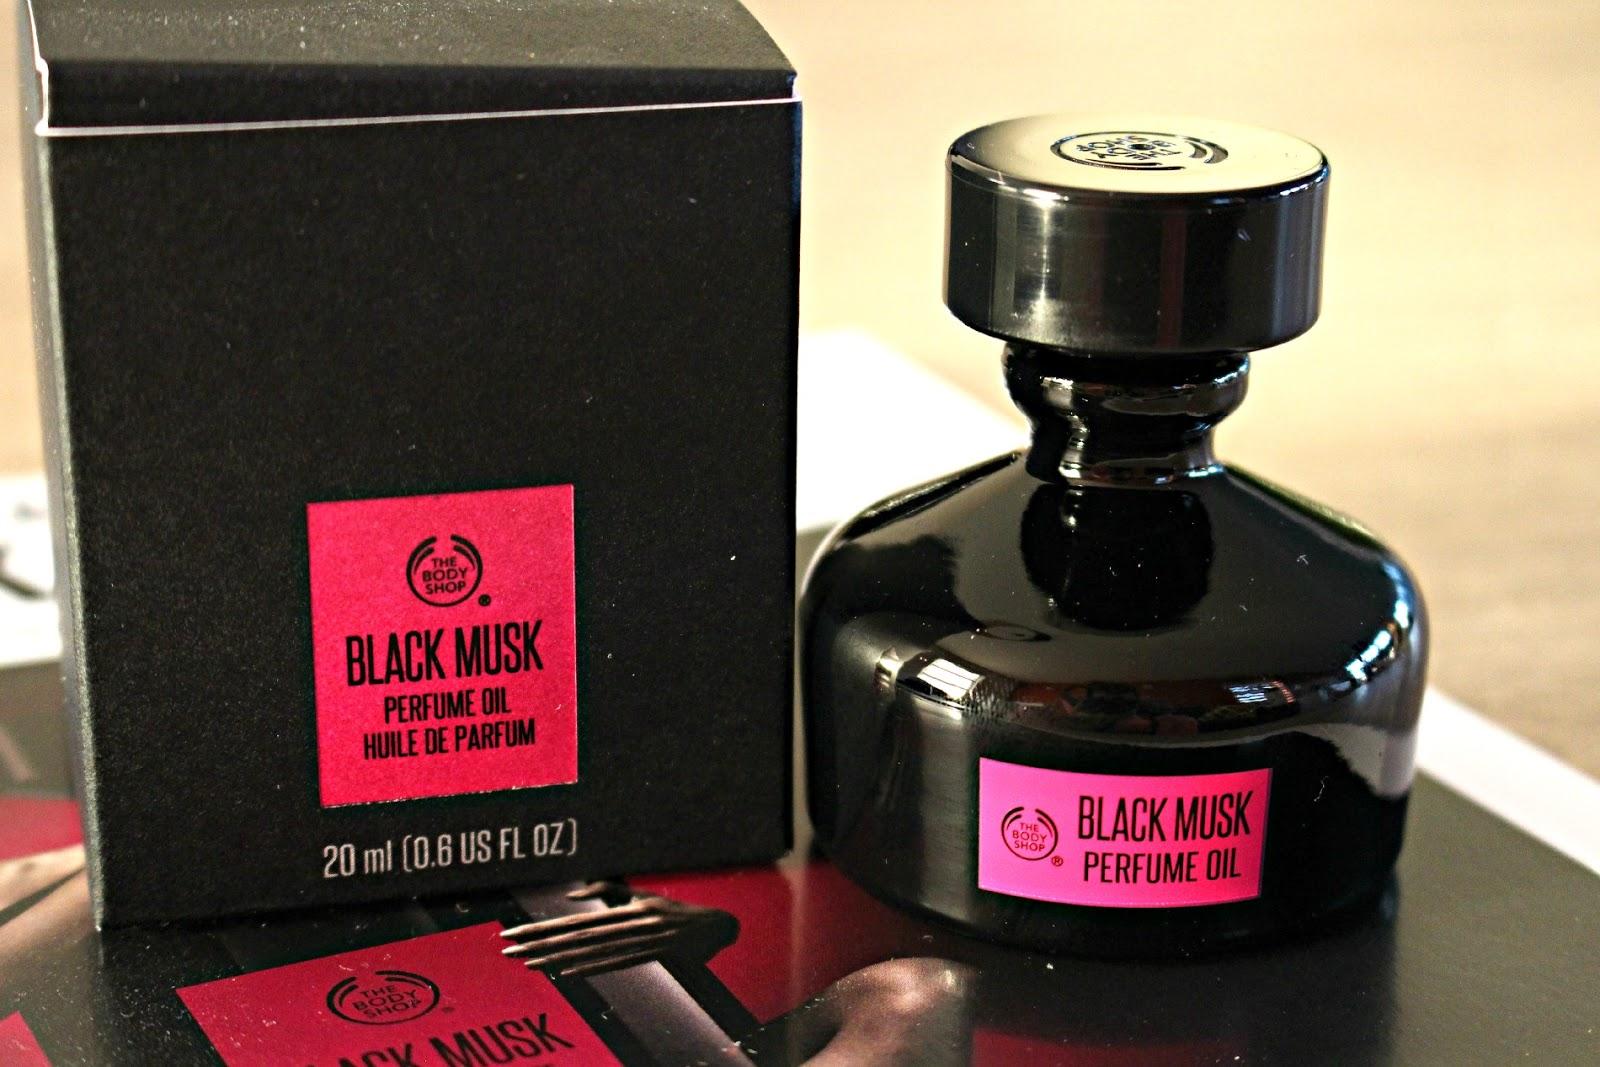 The Body Shop Black Musk